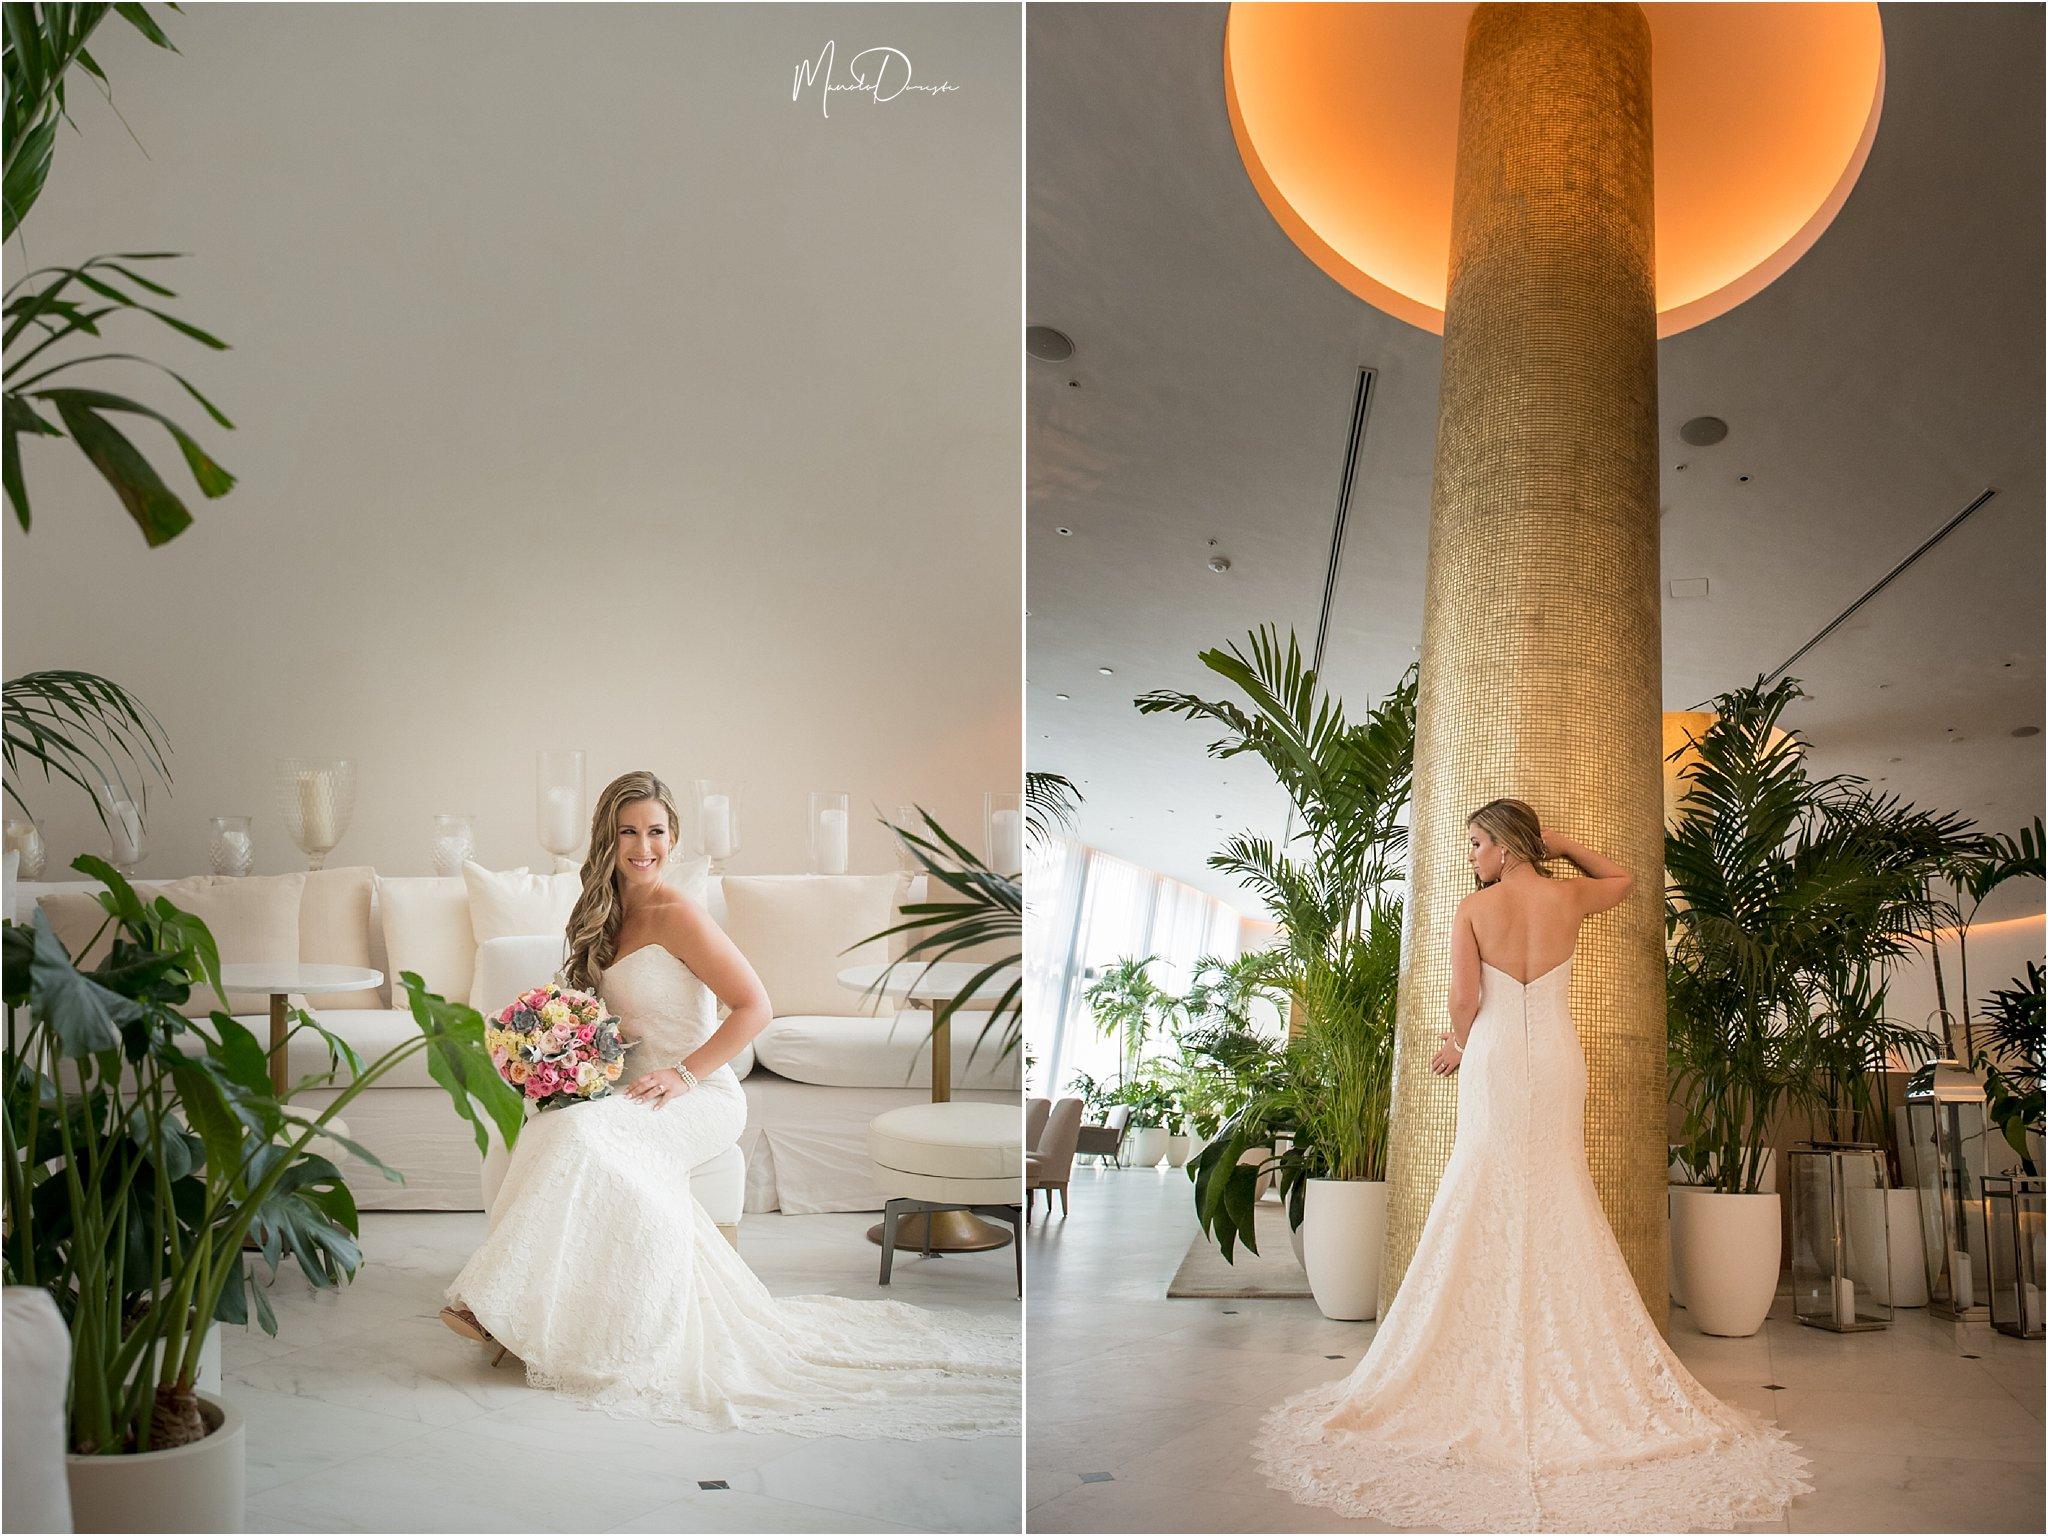 0657_ManoloDoreste_InFocusStudios_Wedding_Family_Photography_Miami_MiamiPhotographer.jpg